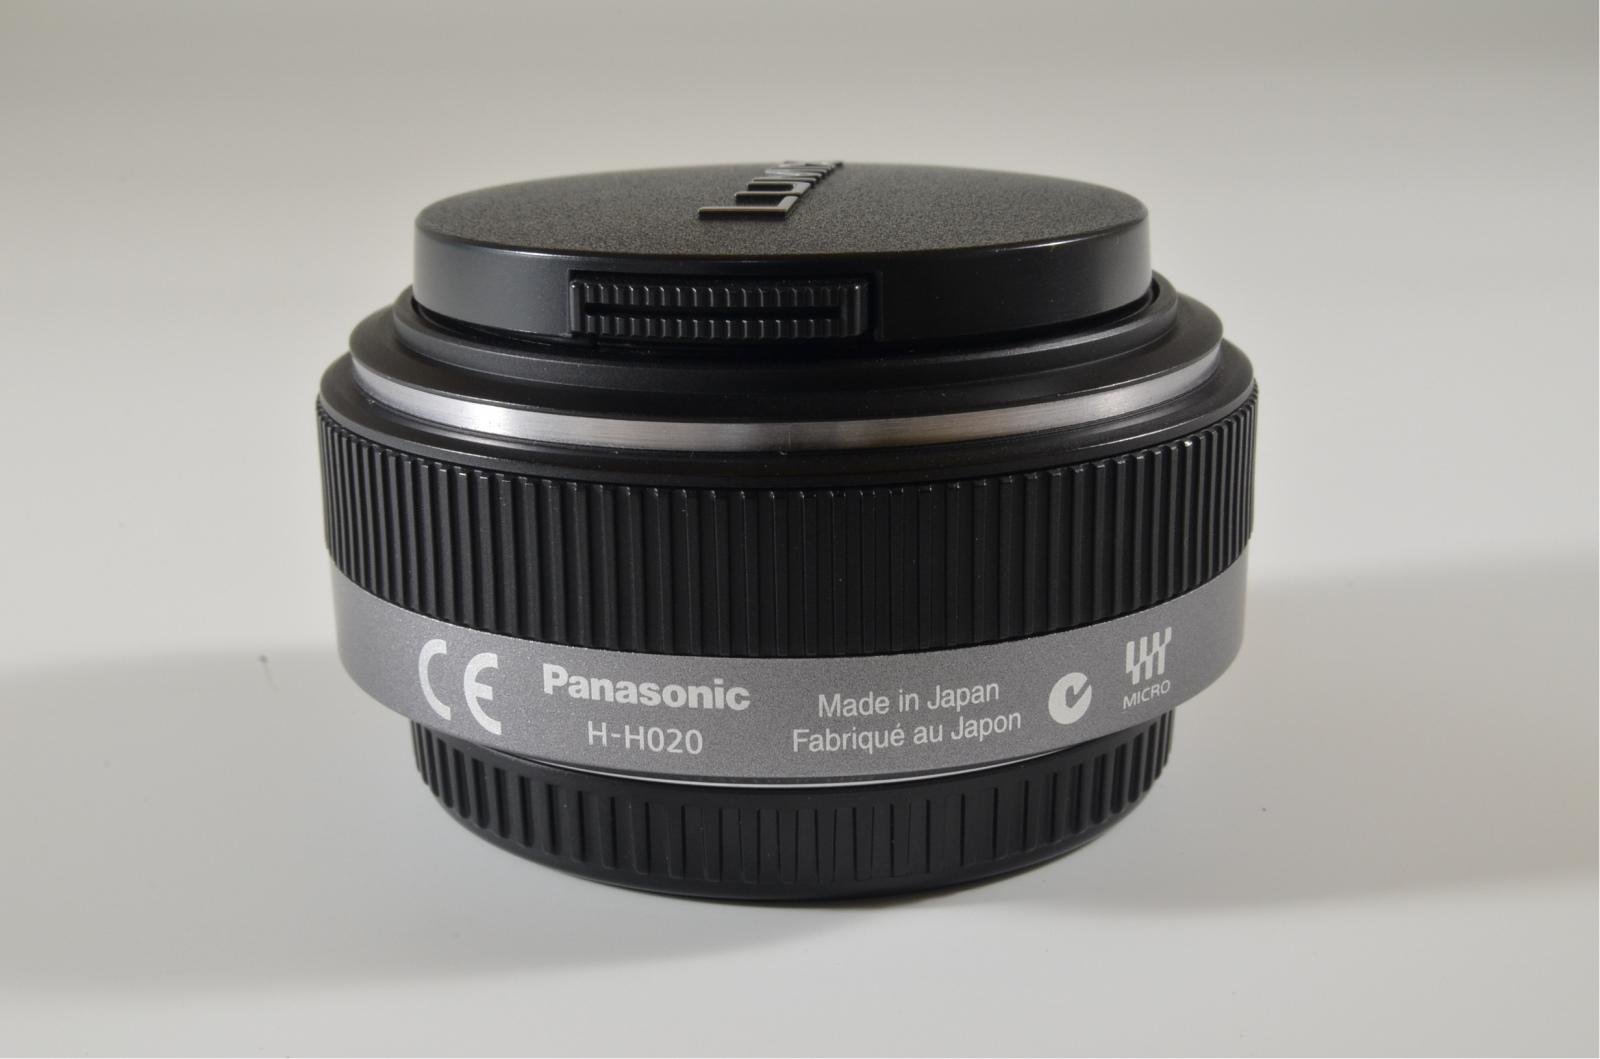 panasonic lumix g 20mm f/1.7 asph h-h020 lens